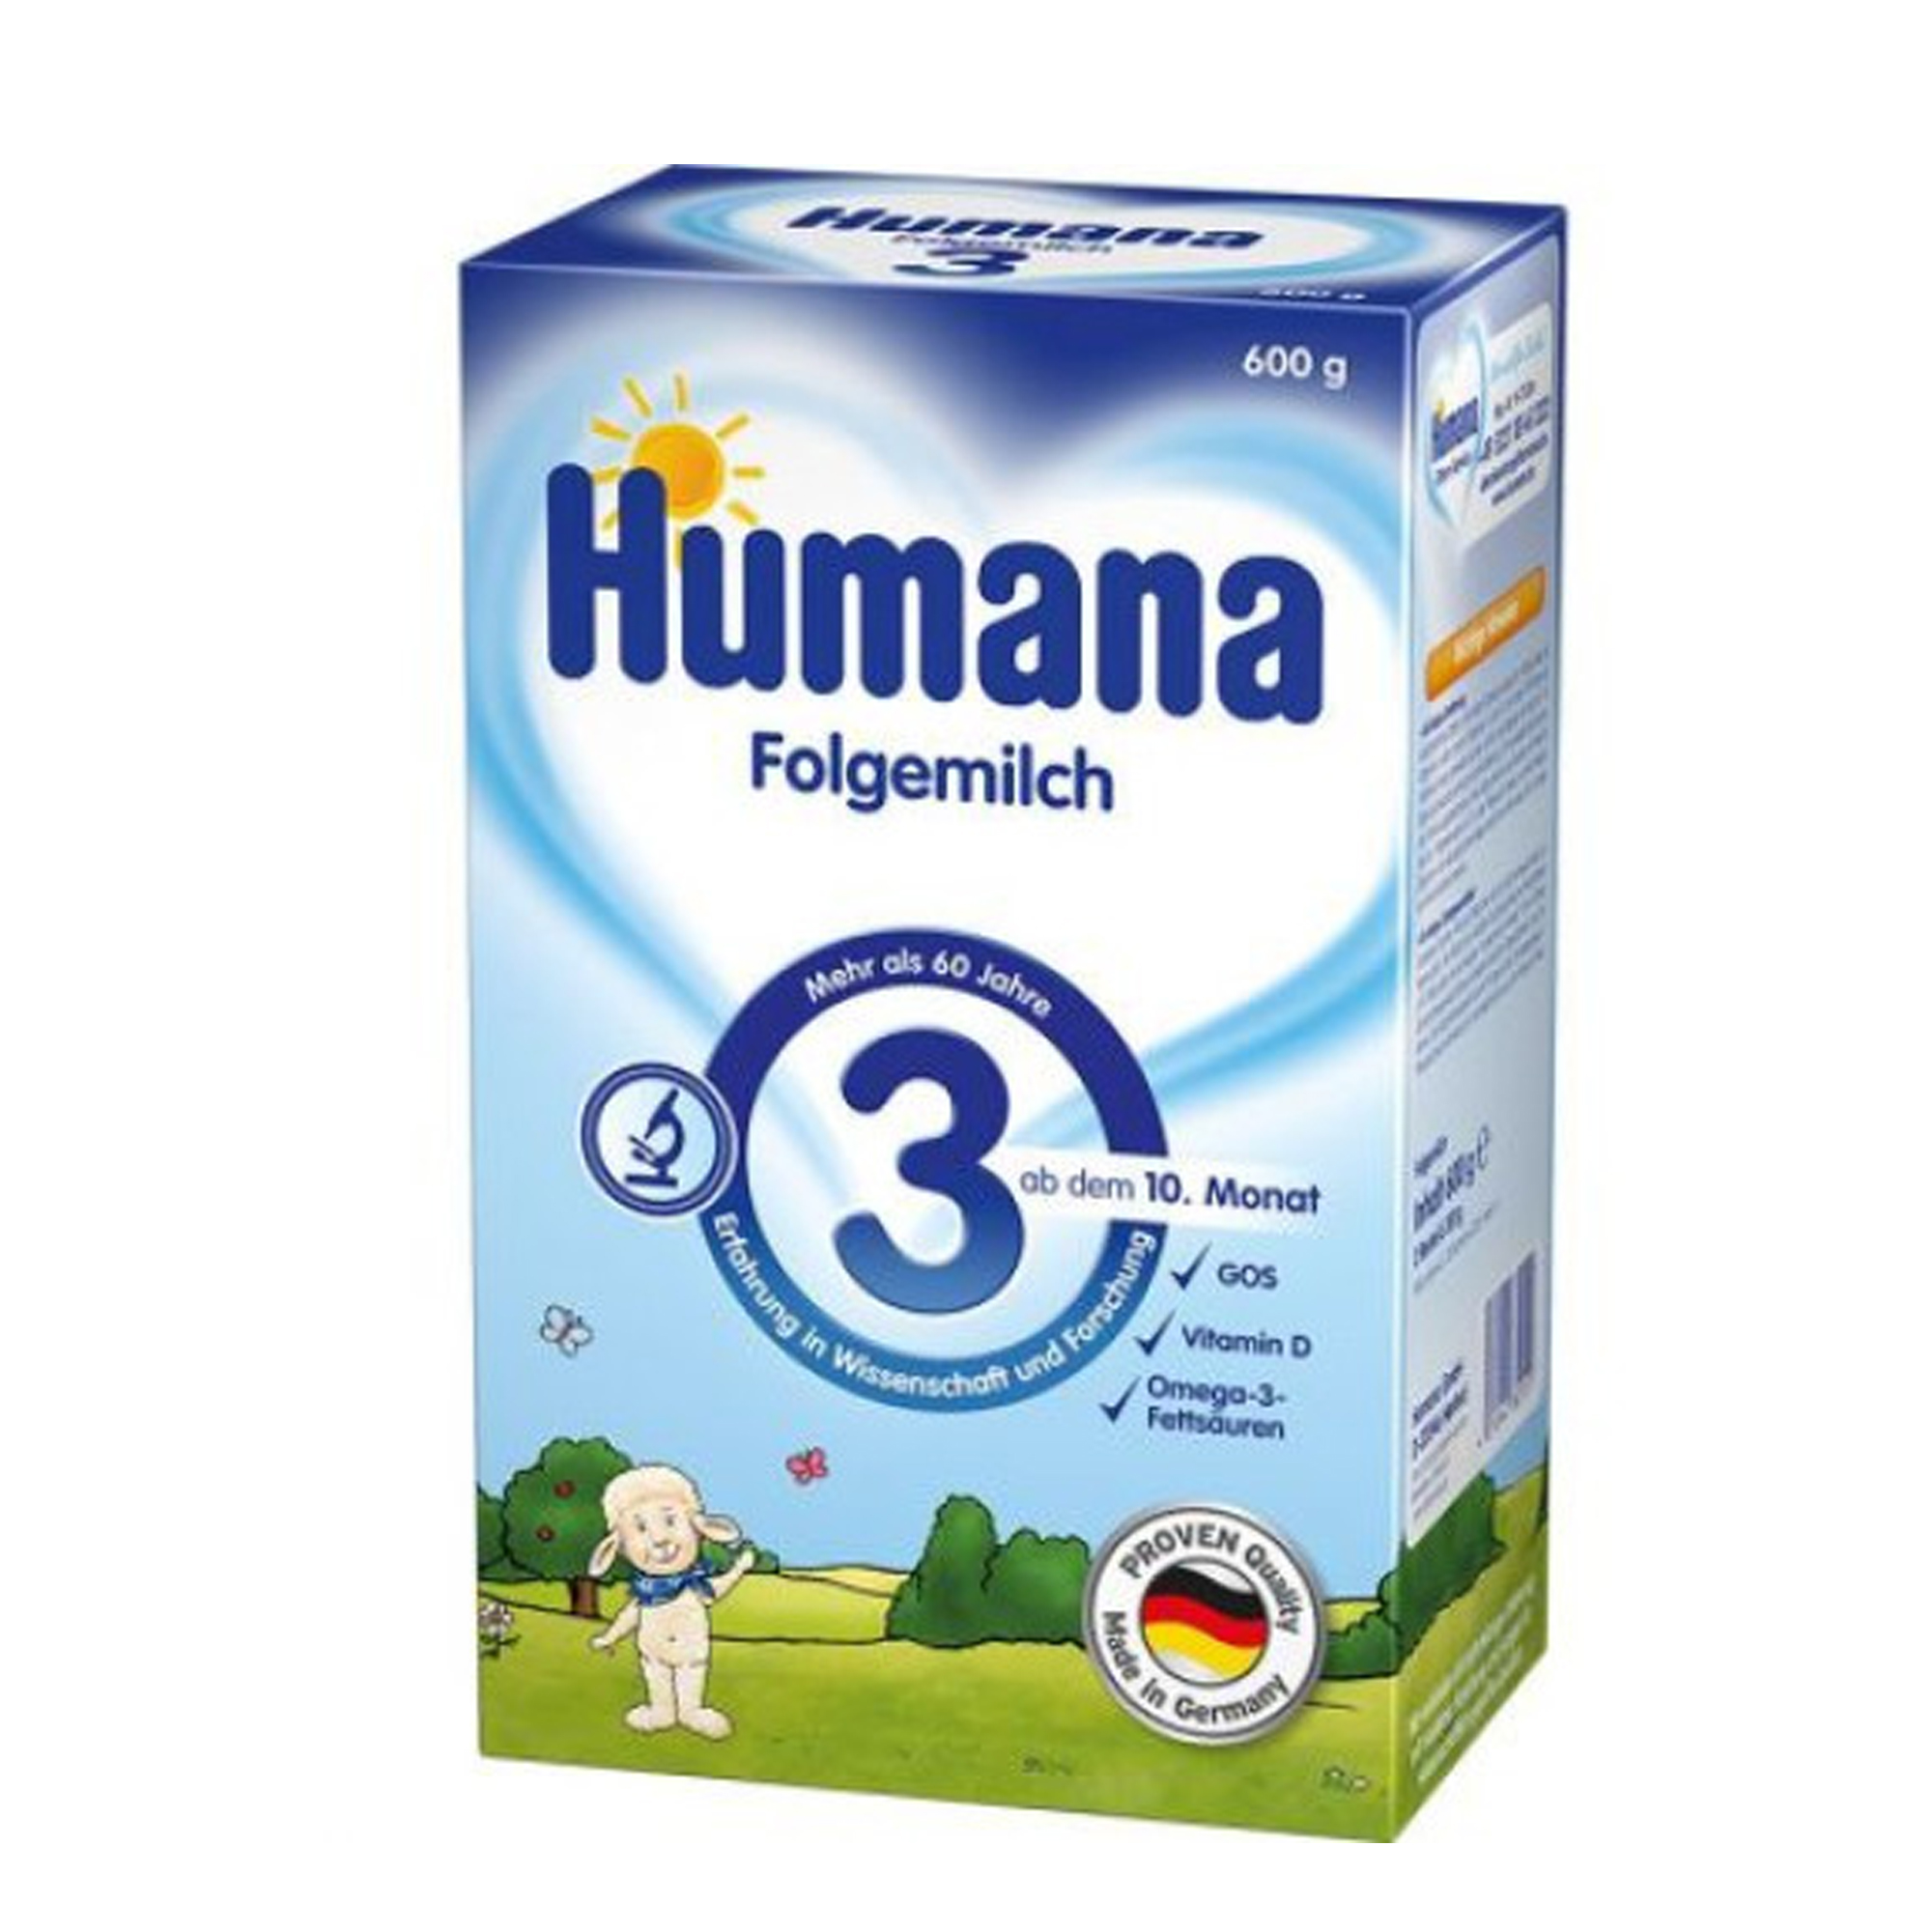 Lapte de continuare, Humana 3 GOS, 600 g, 10 luni+